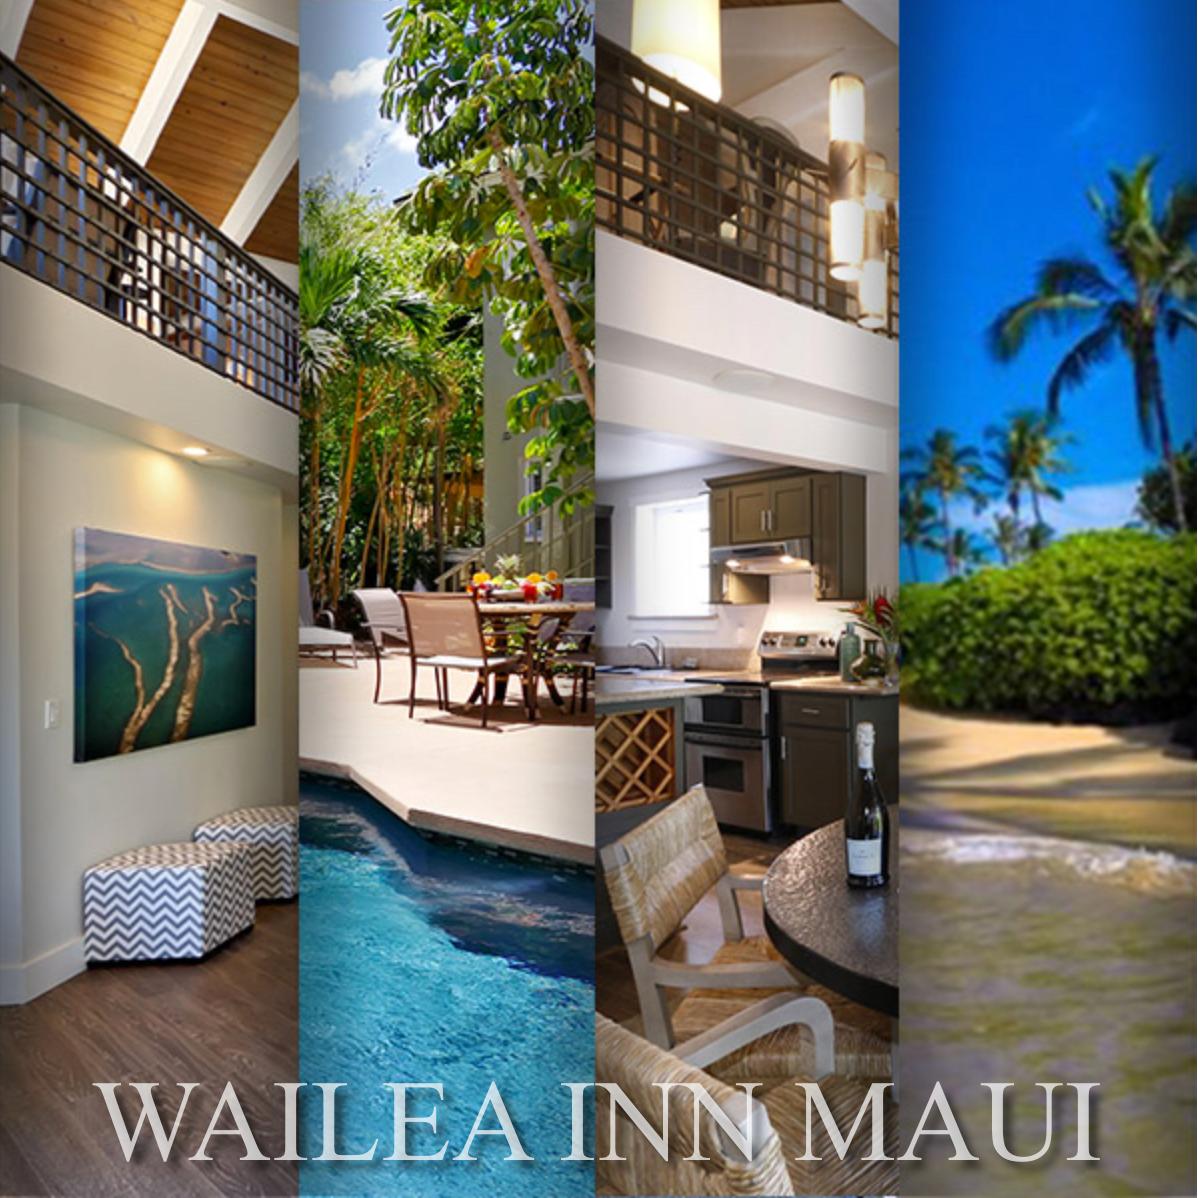 Wailea Inn Maui